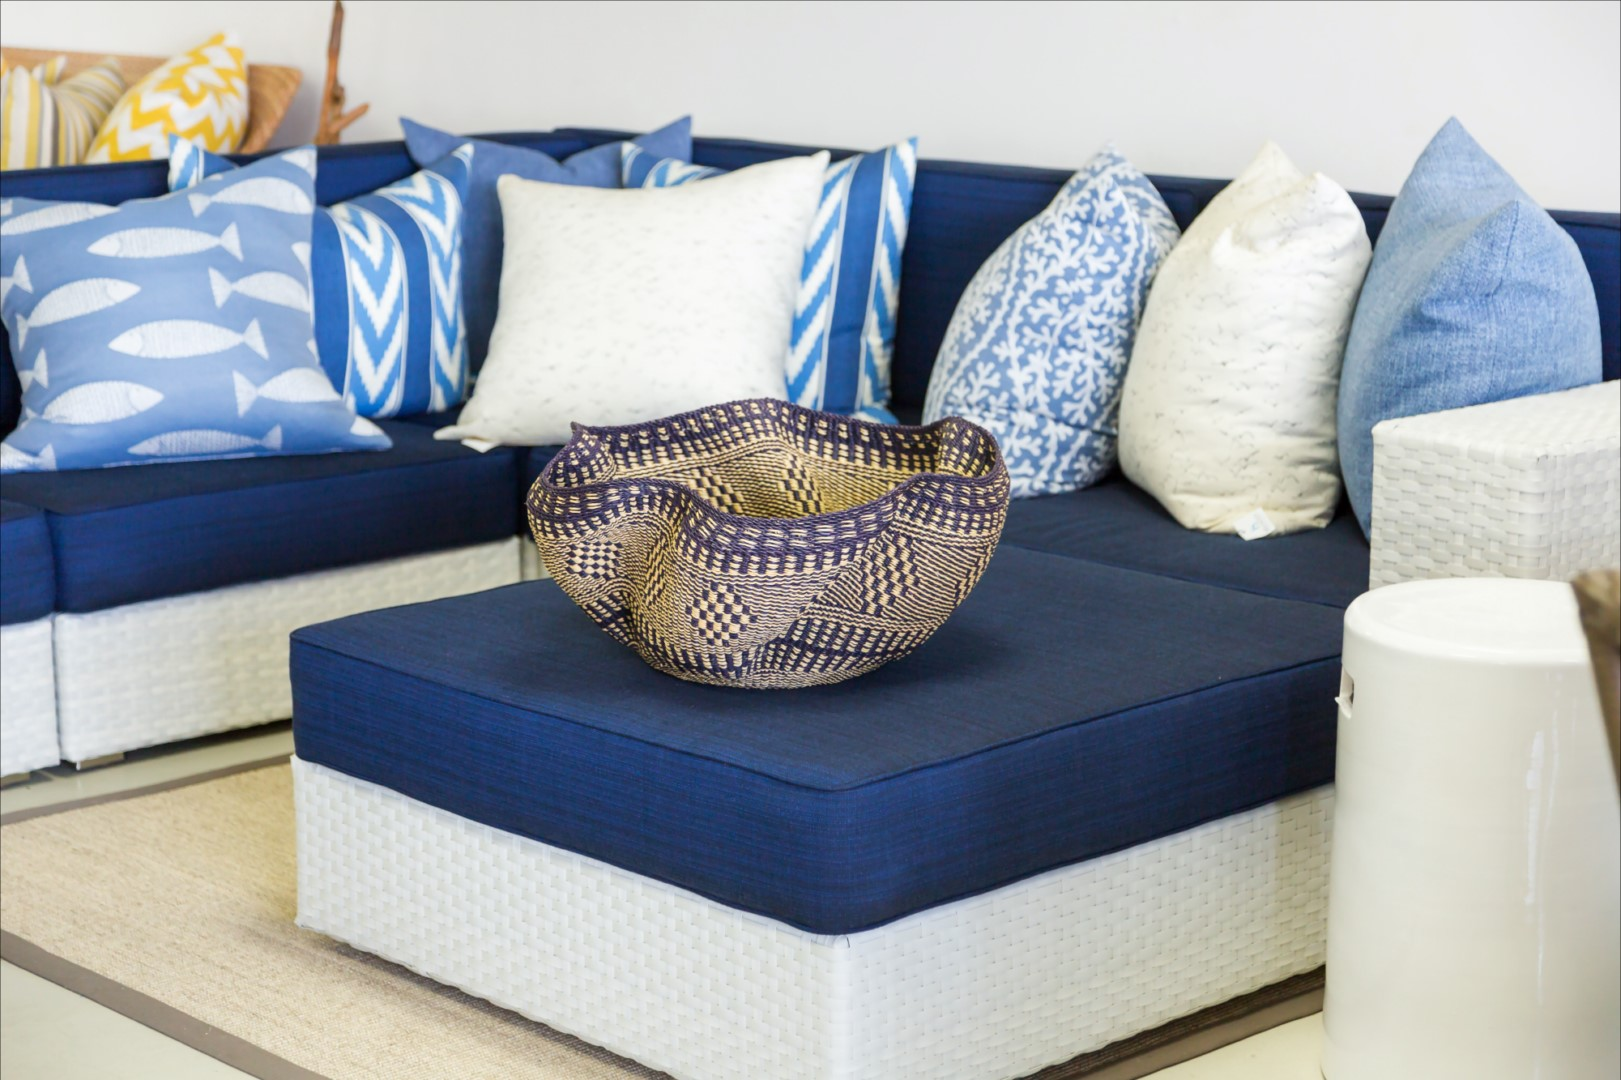 Mirage outdoor furniture